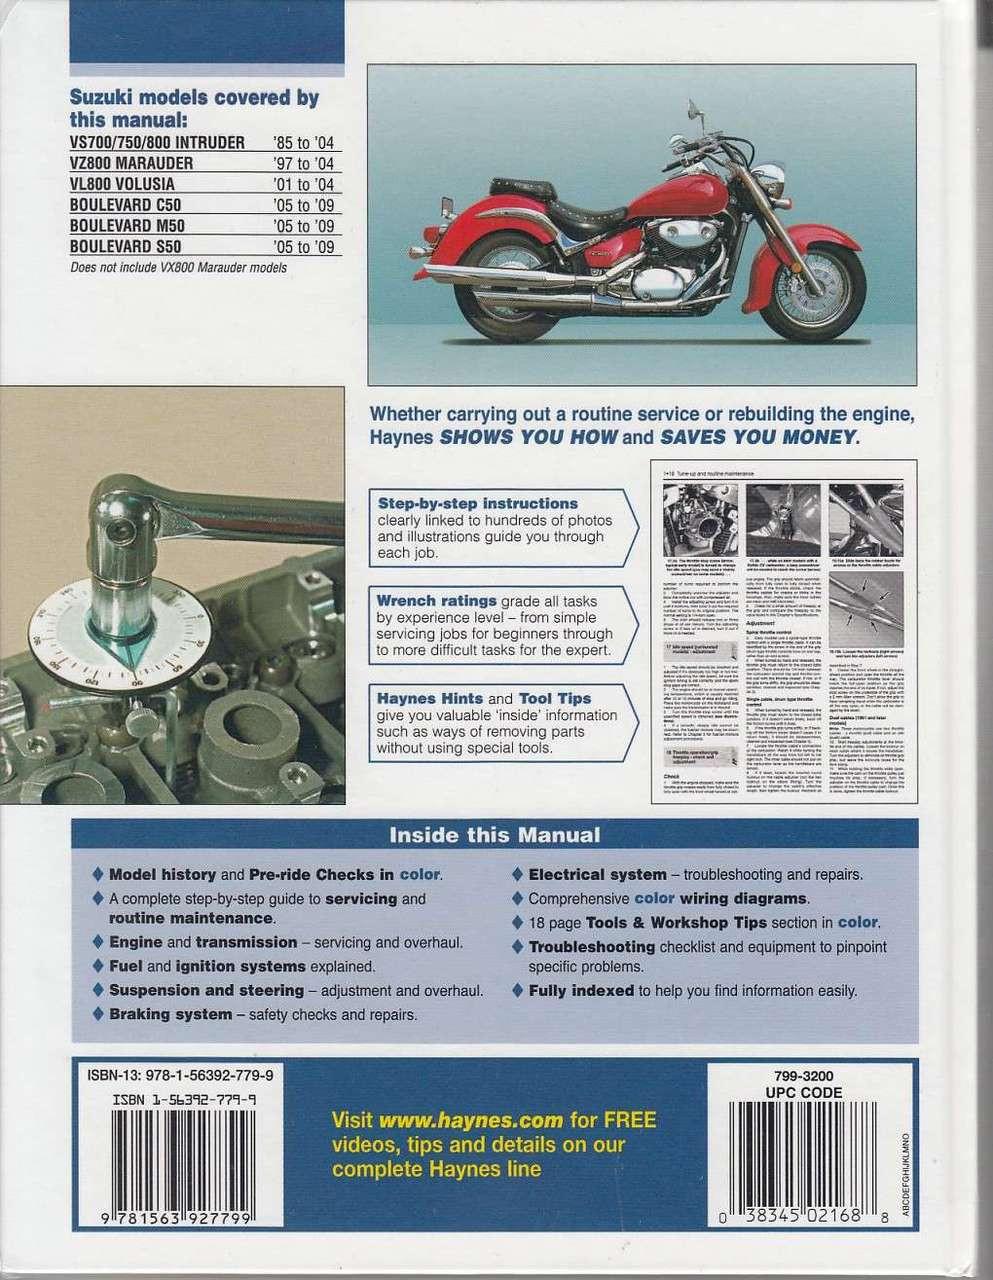 Suzuki Intruder Marauder Volusia And Boulevard 1985 2009 C50 Engine Diagram Workshop Manual Back